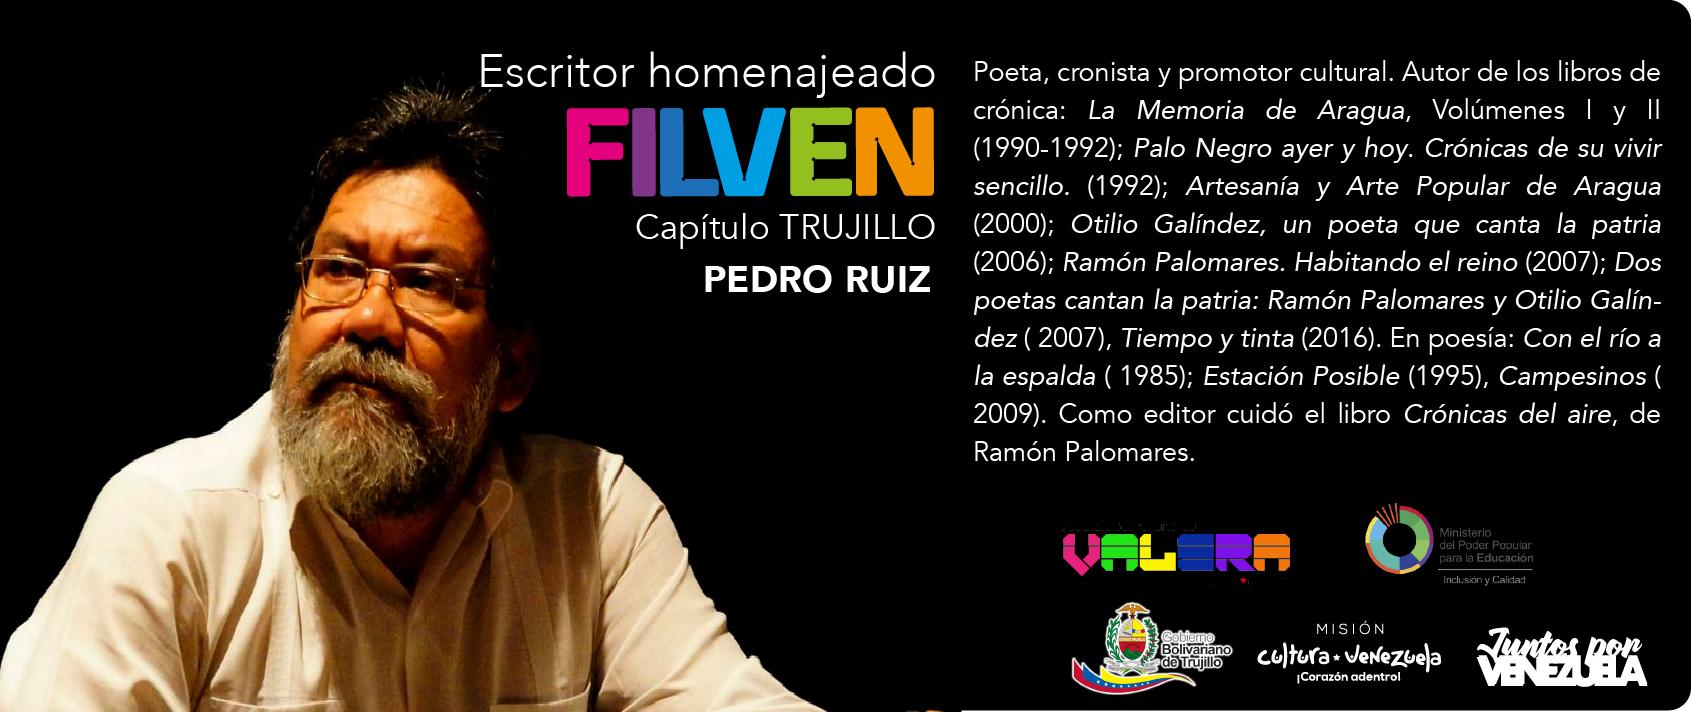 filven 2019 Trujillo homenajeado